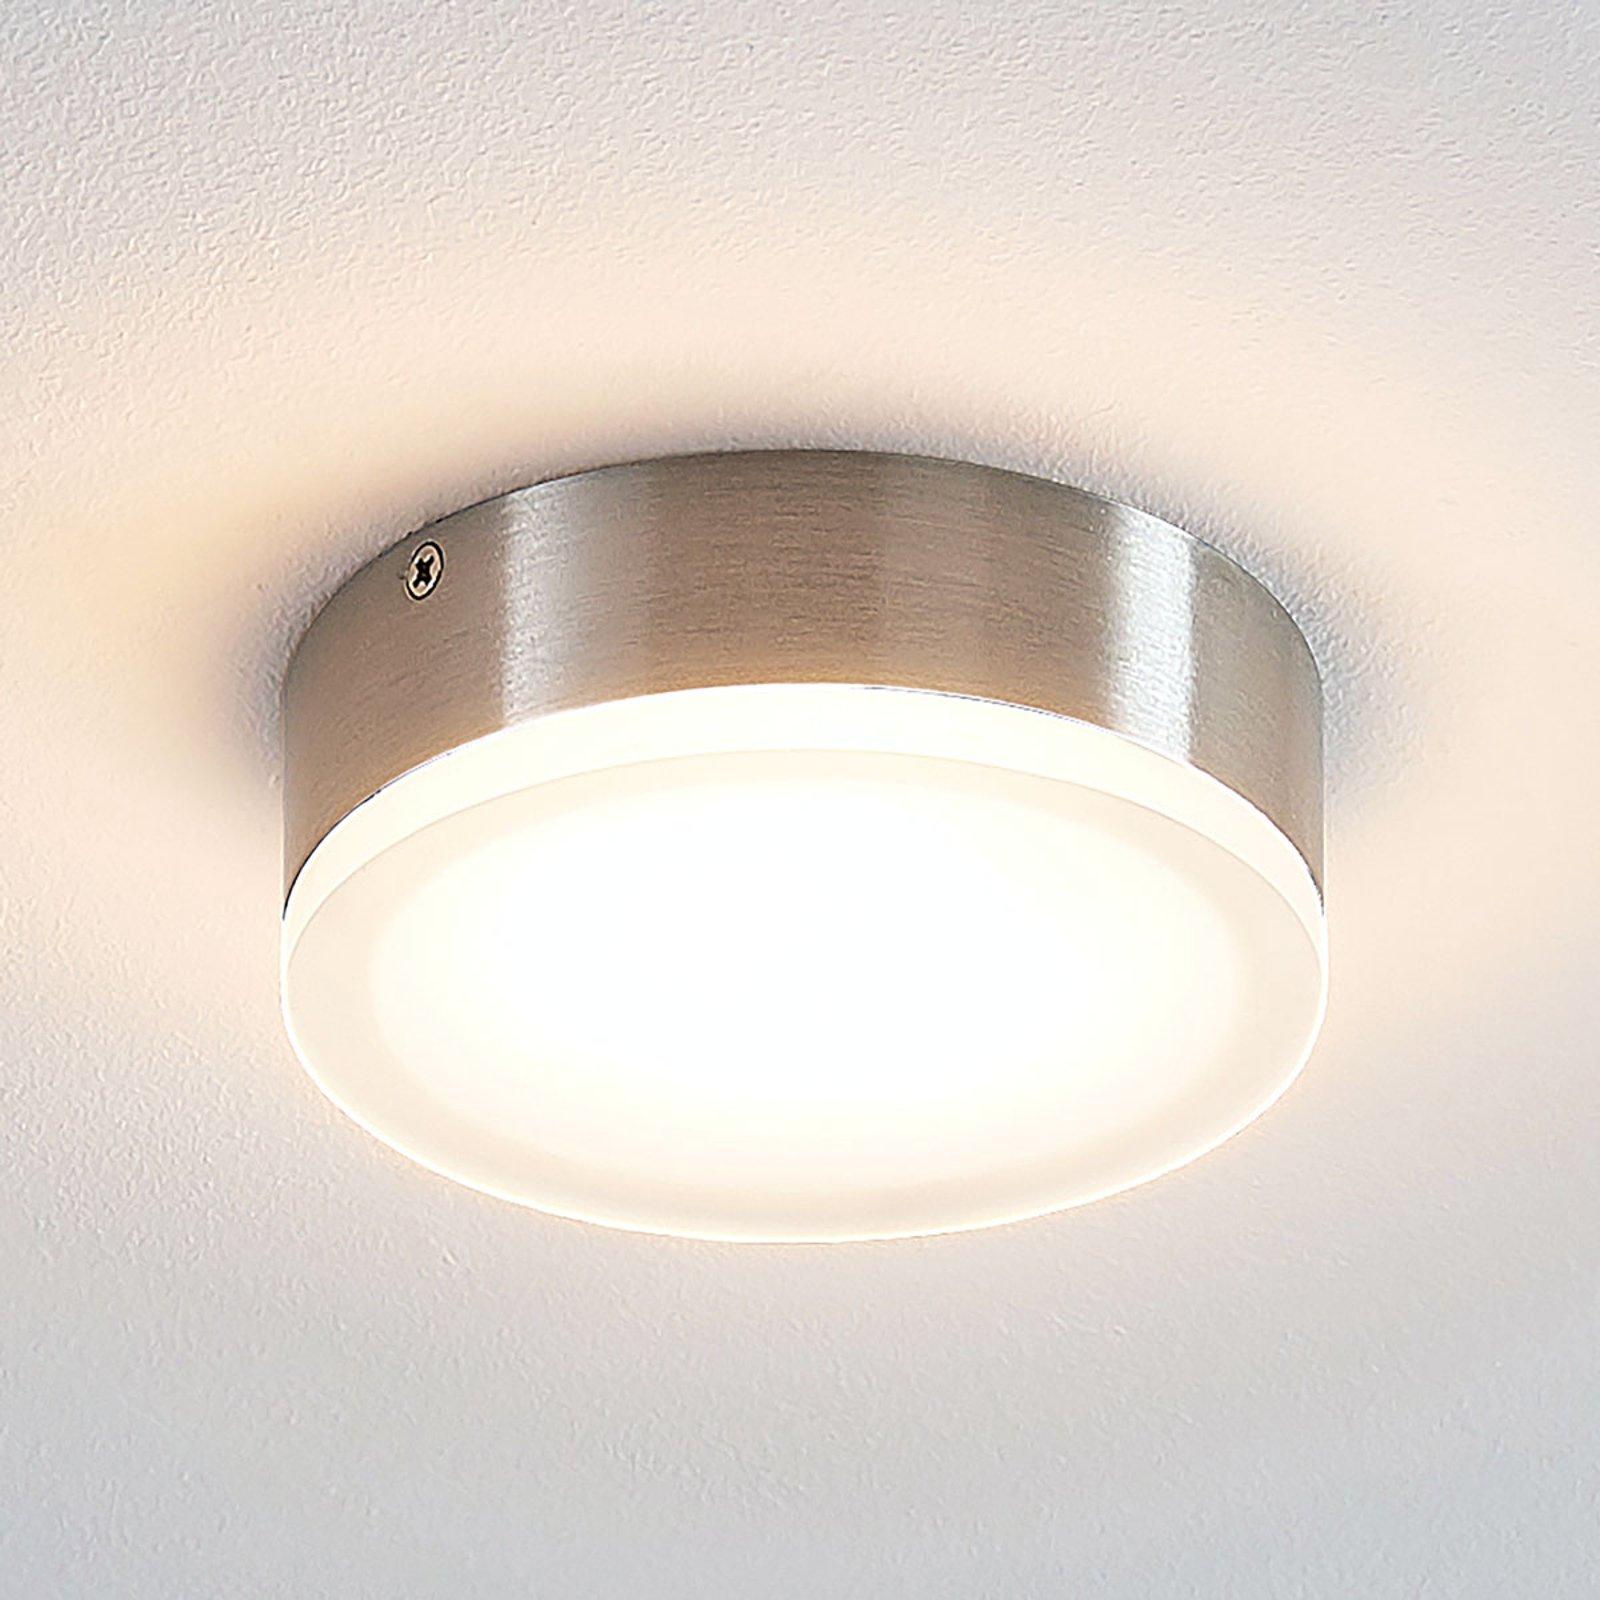 Lindby Leonta LED-taklampe, nikkel, Ø 12 cm